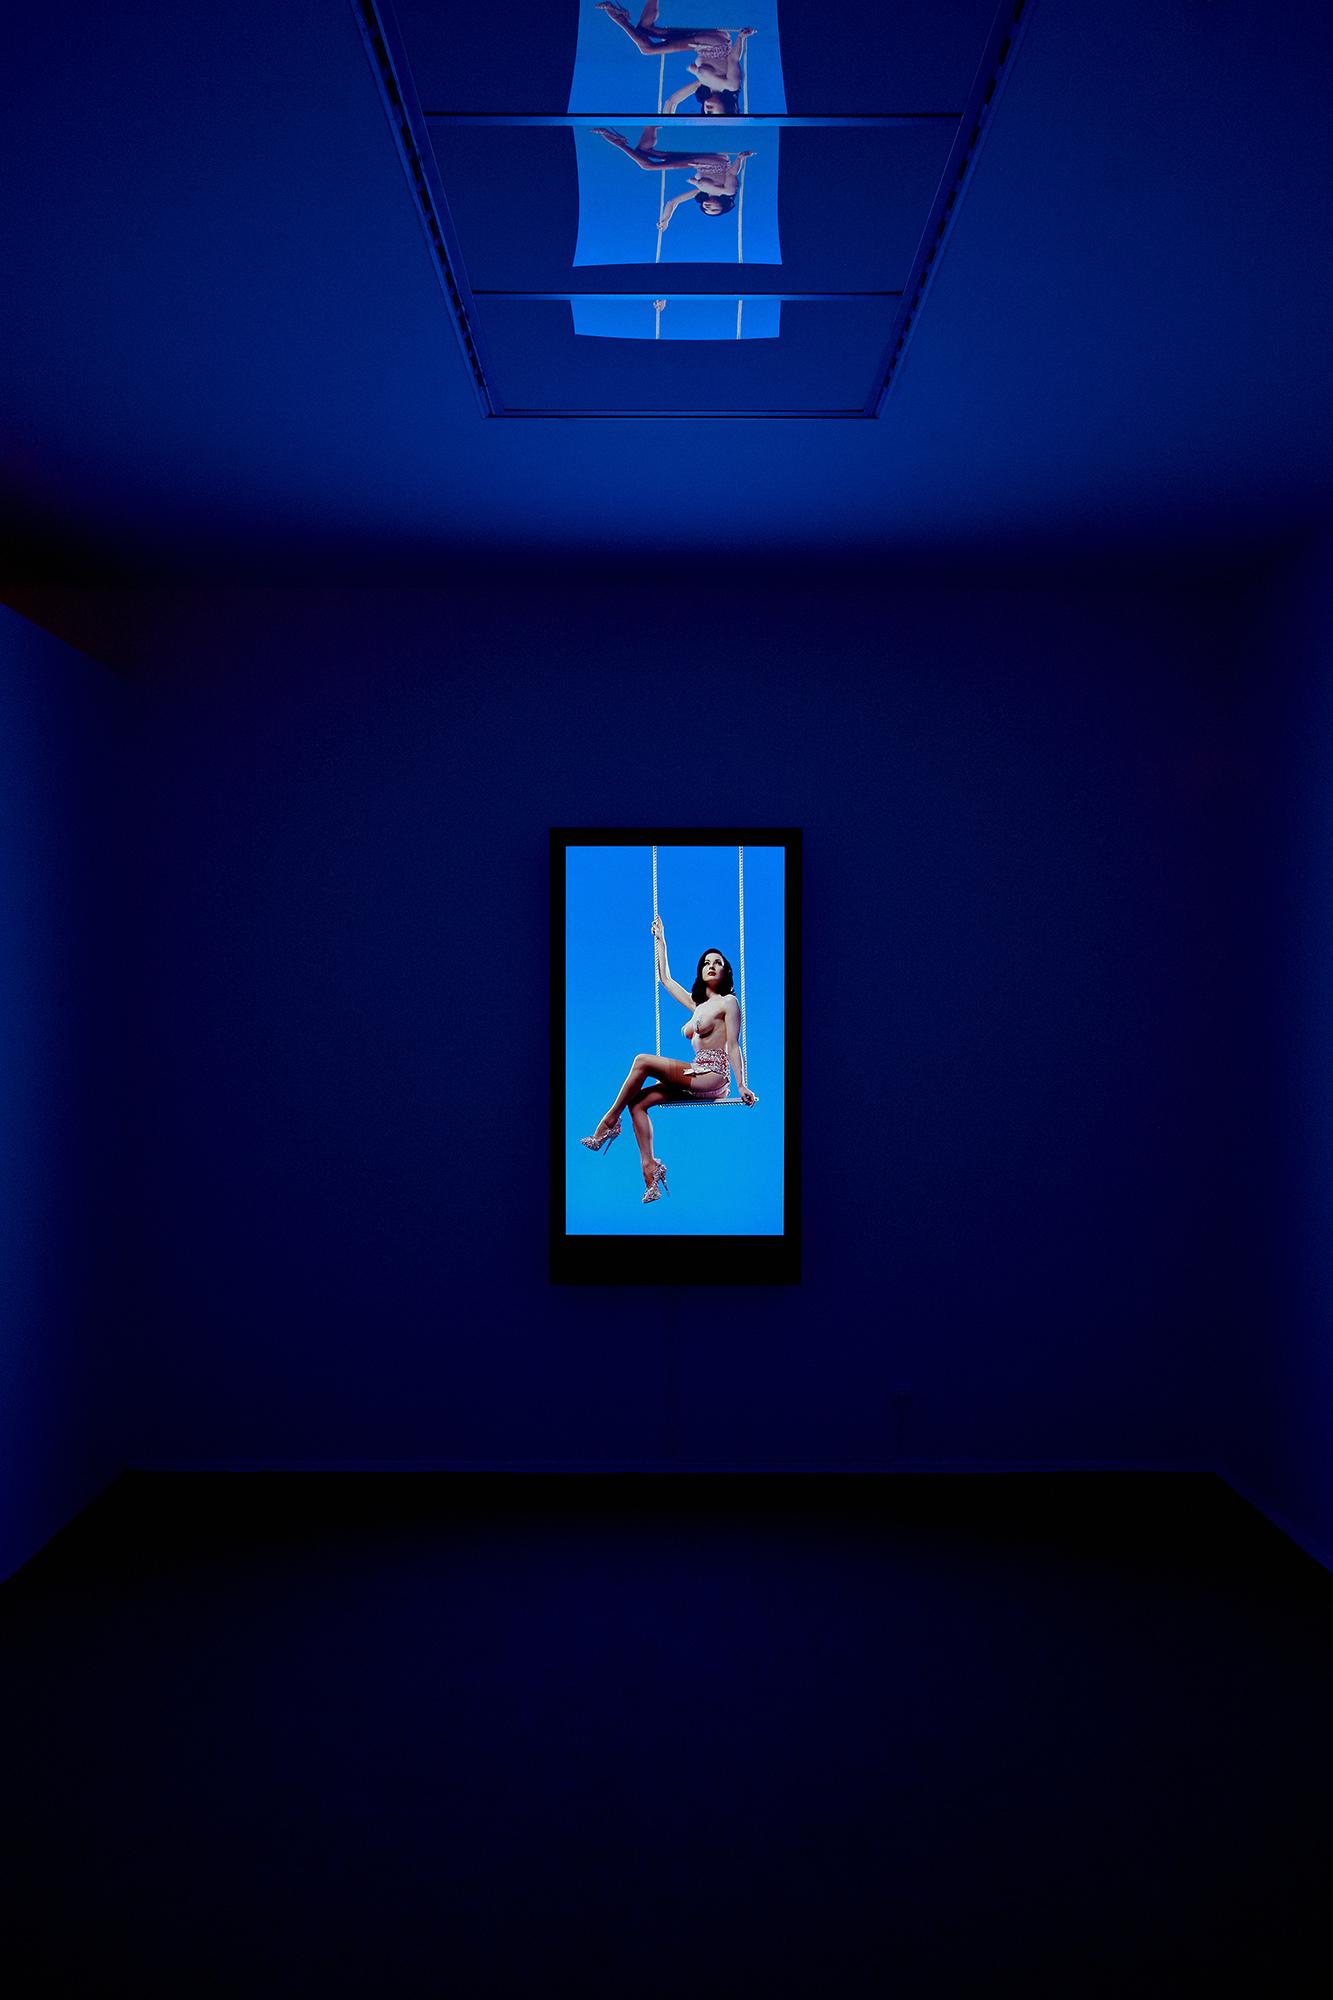 Robert_Willson_exhibition_19.jpg